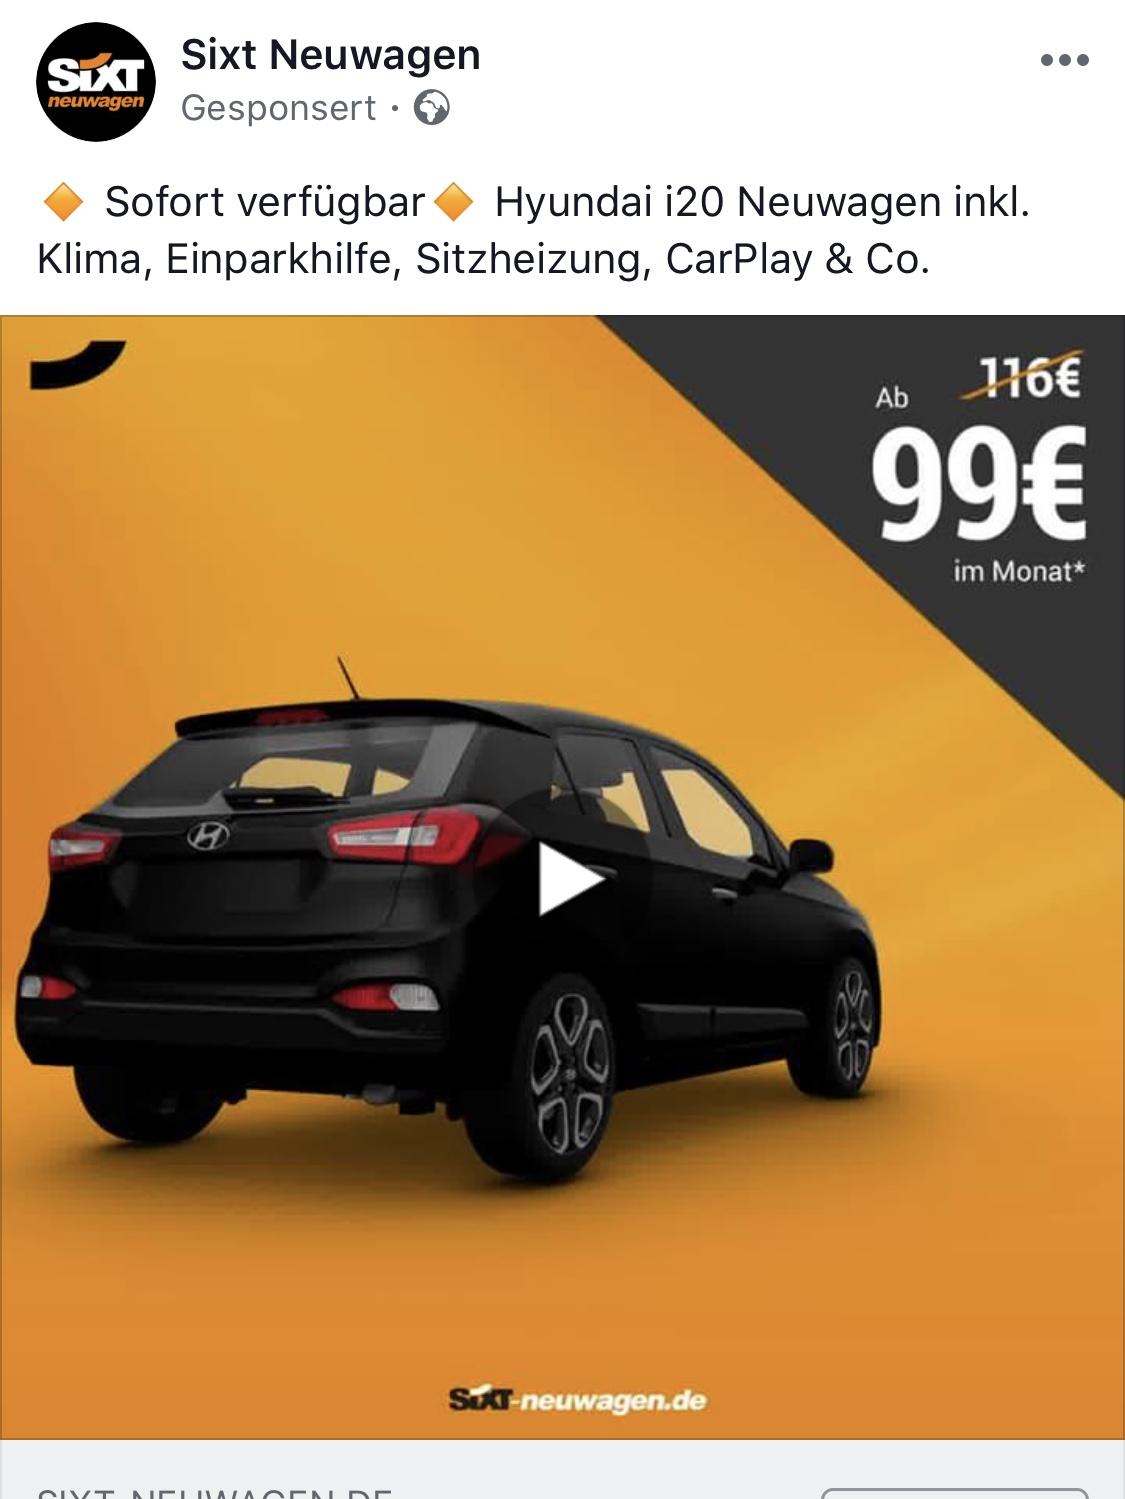 Privat-Leasing: Hyundai i20 mit guter Ausstattung (Rückfahrkamera!) ab 99€ (Gewerbe billiger!)